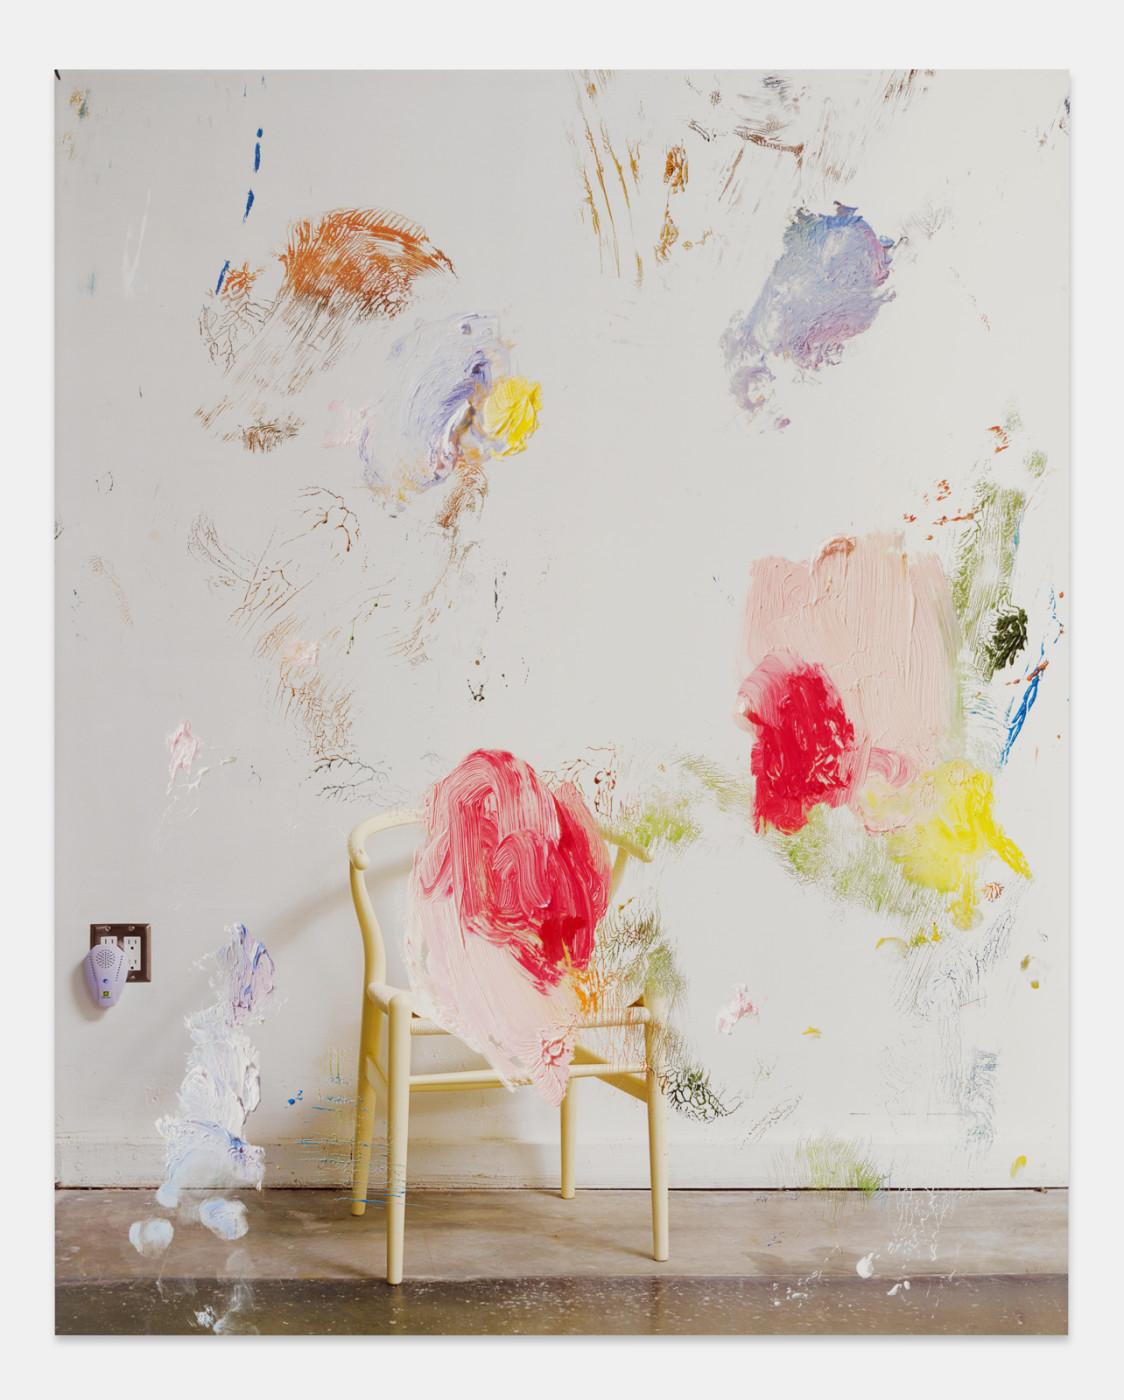 "<div class=""artwork_caption""><div class=""title""><em>White Chair</em>, 2021</div><div class=""medium"">aluminium composite panel, aluminium honeycomb, polyurethane adhesive, epoxy primer, gesso, solvent-based screen printing paint, water-based screen printing paint</div><div class=""dimensions"">site size: 243.8 x 194.9 x 2.2 cm / 96 x 76 ¾ x ⅞ in<br />frame size: 247.6 x 198.7 x 5.1 cm / 97 ½ x 78 ¼ x 2 ⅛ in</div></div><div class=""link""><span class=""website_contact_form"" data-contact-form-details=""White Chair, 2021  aluminium composite panel, aluminium honeycomb, polyurethane adhesive, epoxy primer, gesso, solvent-based screen printing paint, water-based screen printing paint  site size: 243.8 x 194.9 x 2.2 cm / 96 x 76 ¾ x ⅞ in frame size: 247.6 x 198.7 x 5.1 cm / 97 ½ x 78 ¼ x 2 ⅛ in"" data-contact-form-image=""https://artlogic-res.cloudinary.com/w_200,h_200,c_fill,f_auto,fl_lossy/ws-sadiecoles/usr/exhibitions/images/exhibitions/859/hq24-uf17311p_uf21003_white_chair_b_rt_canonical.jpeg"">Enquire</span></div>"